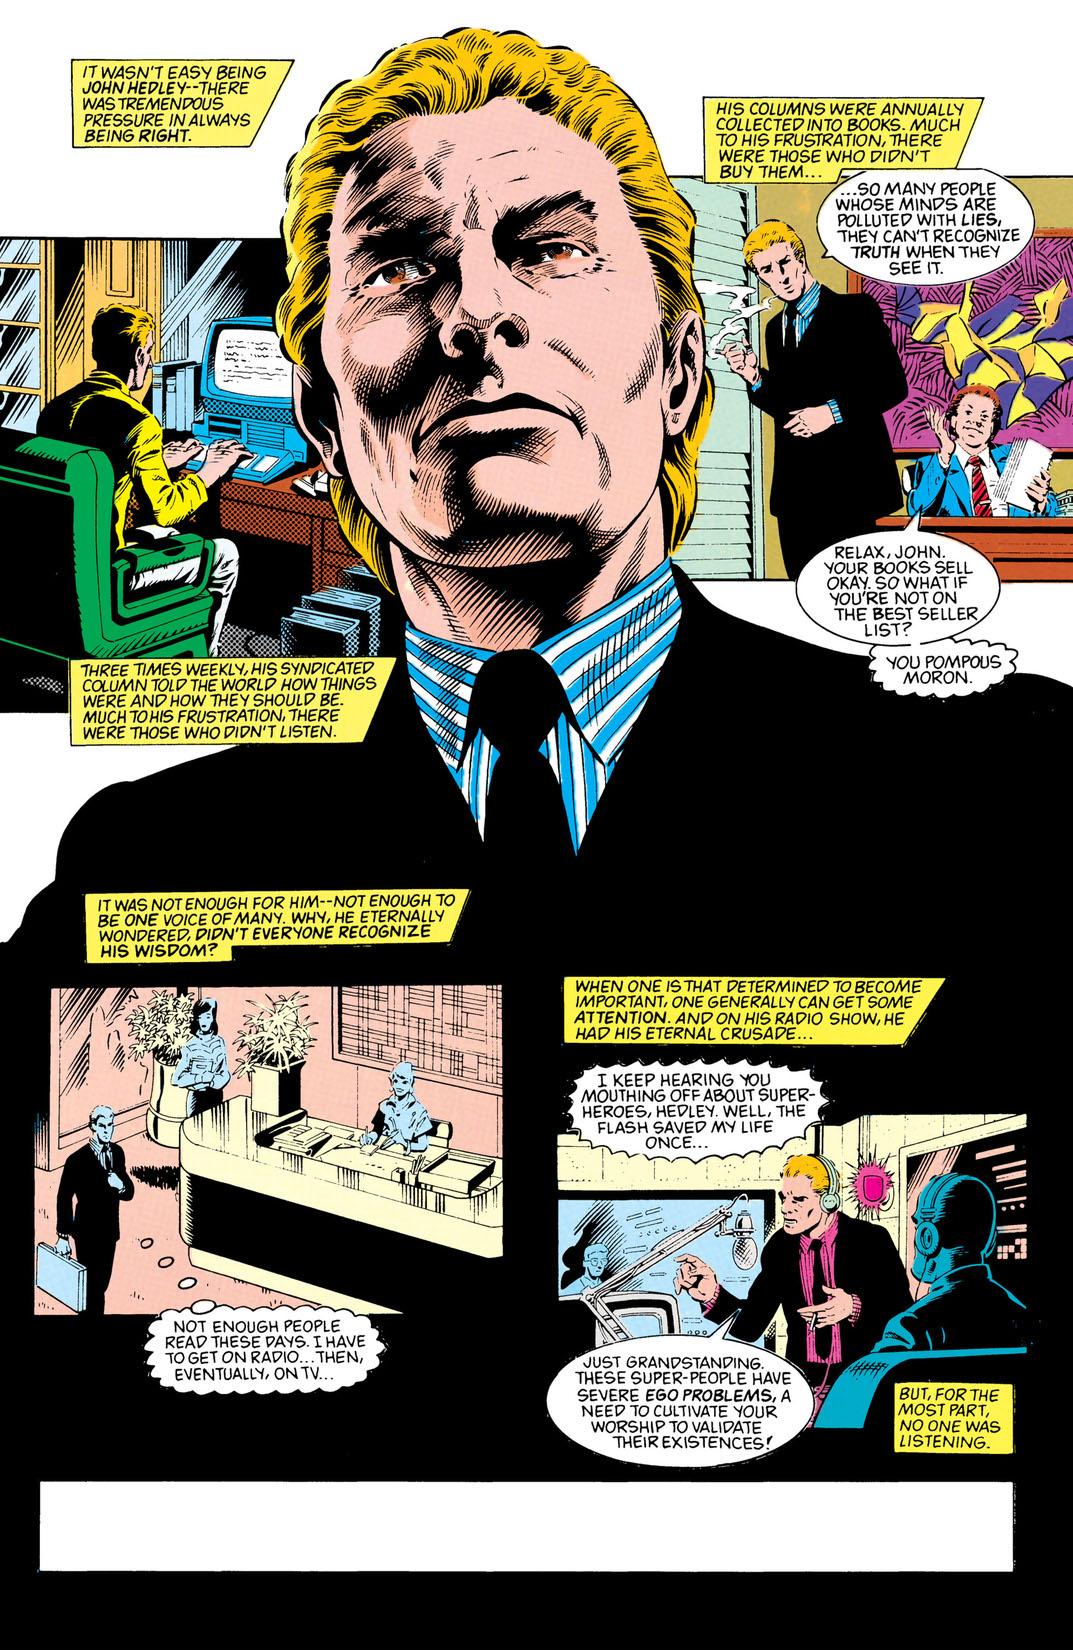 Read New Gods (1989-) #16 on DC Universe